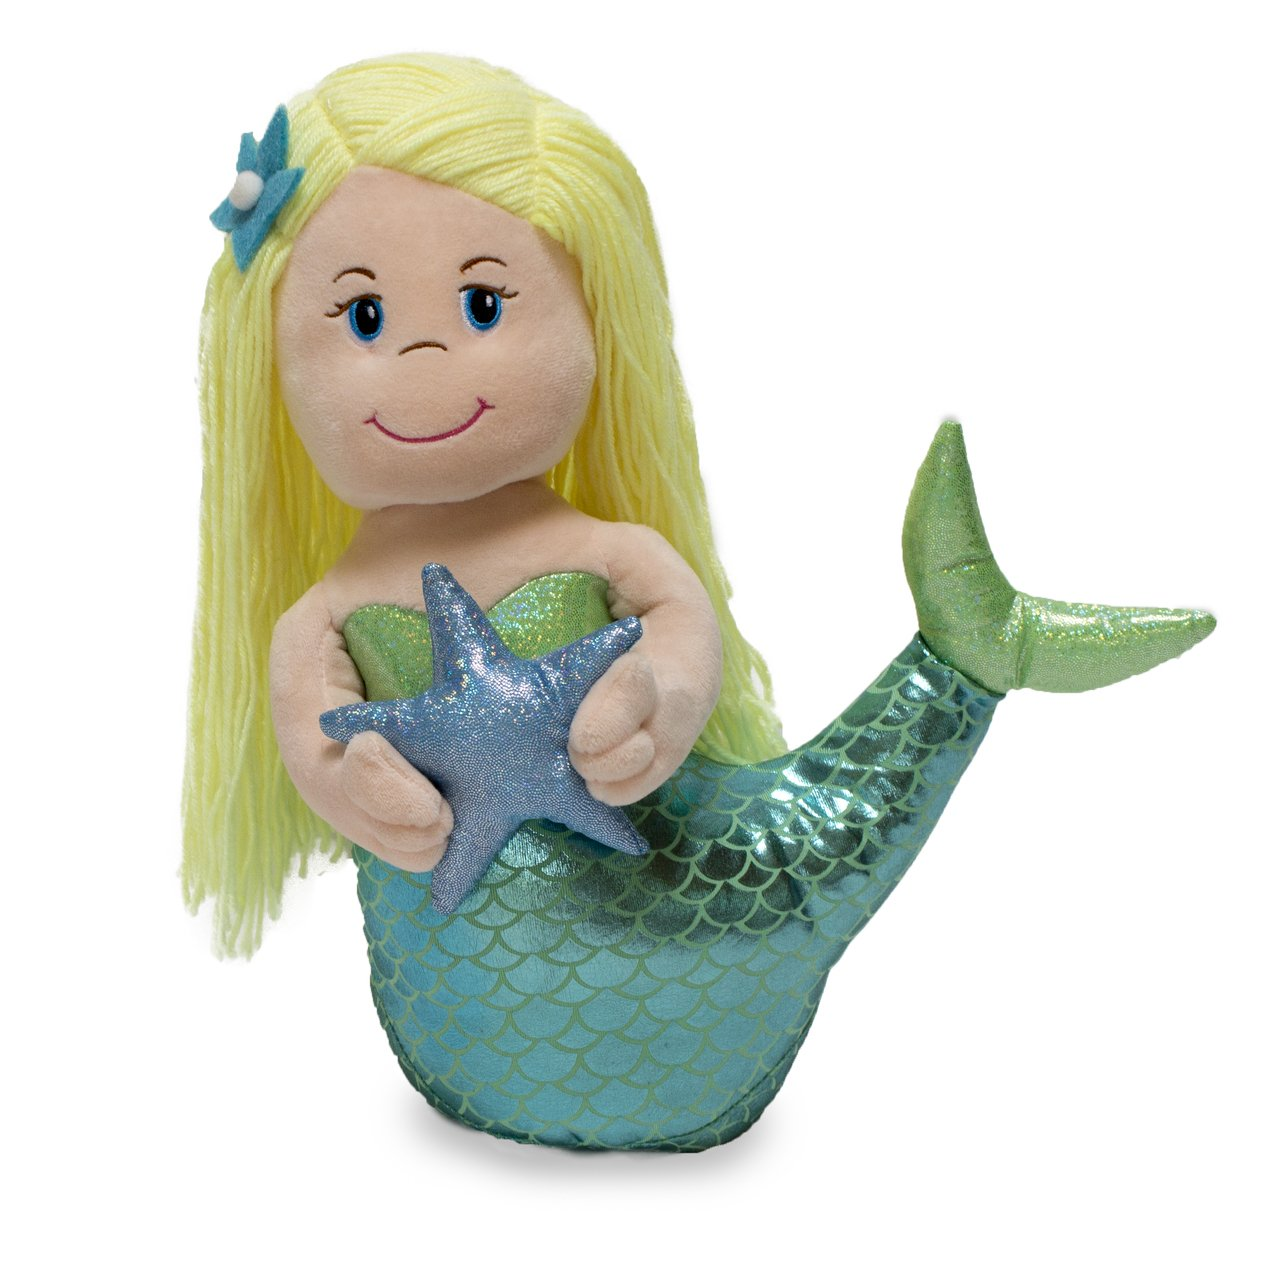 Cuddle Barn - Phoebe the Singing Mermaid   B01M5F42HA